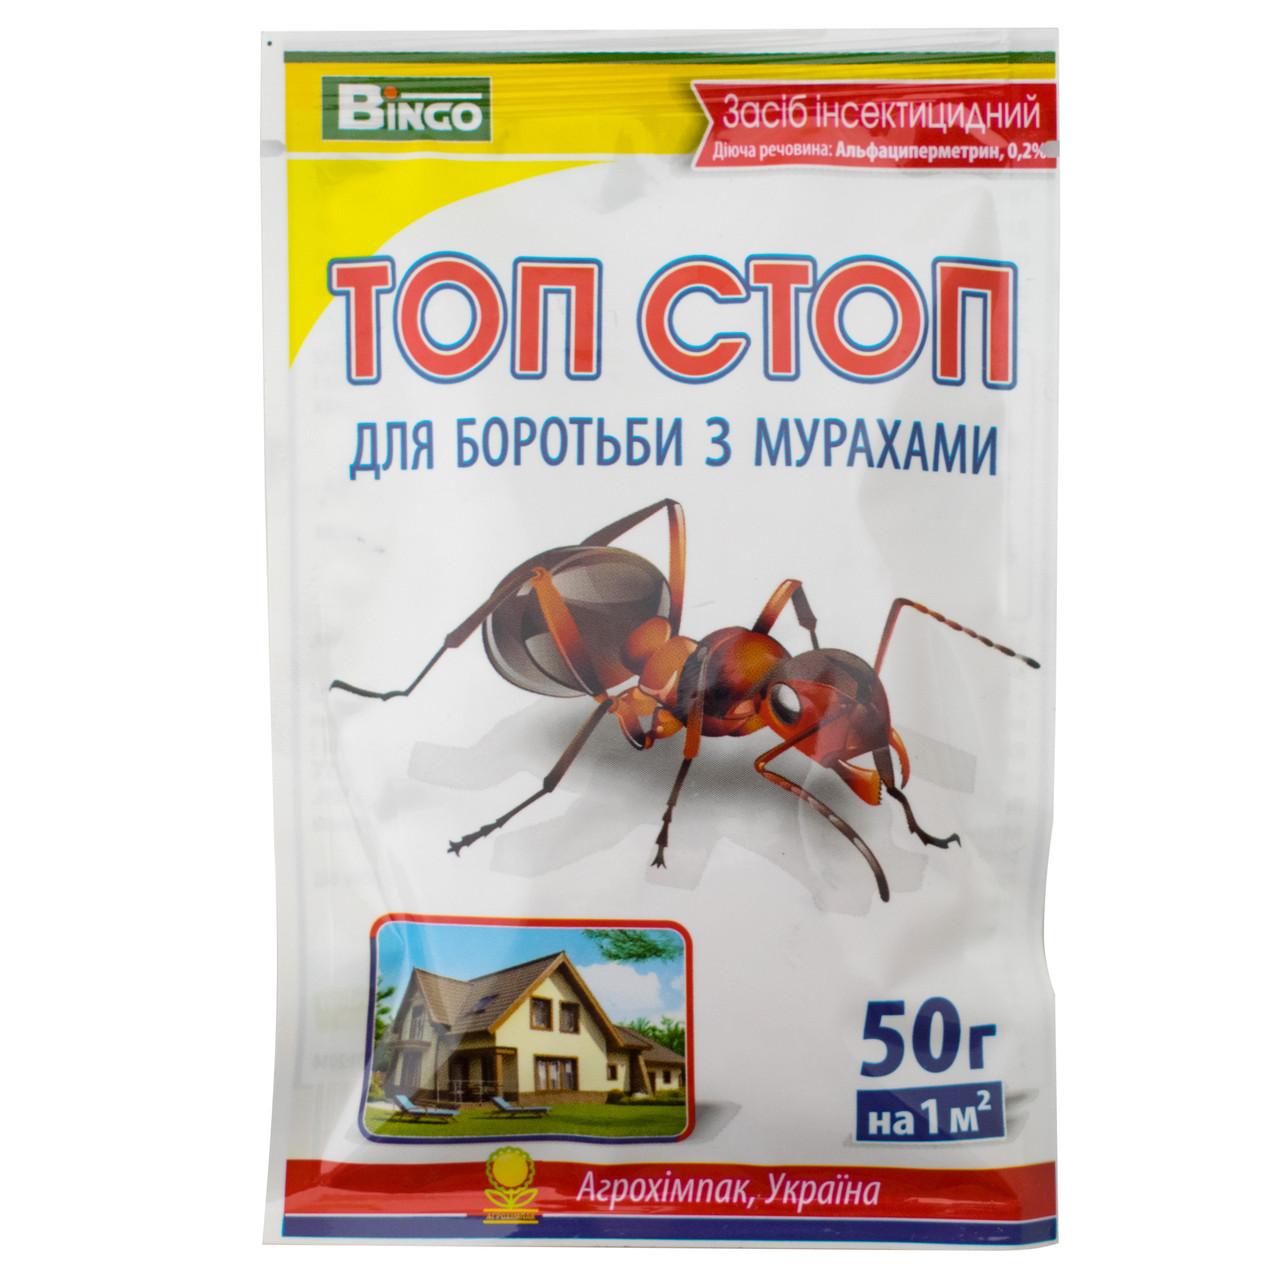 Кристаллы от муравьев Топ стоп 50 г